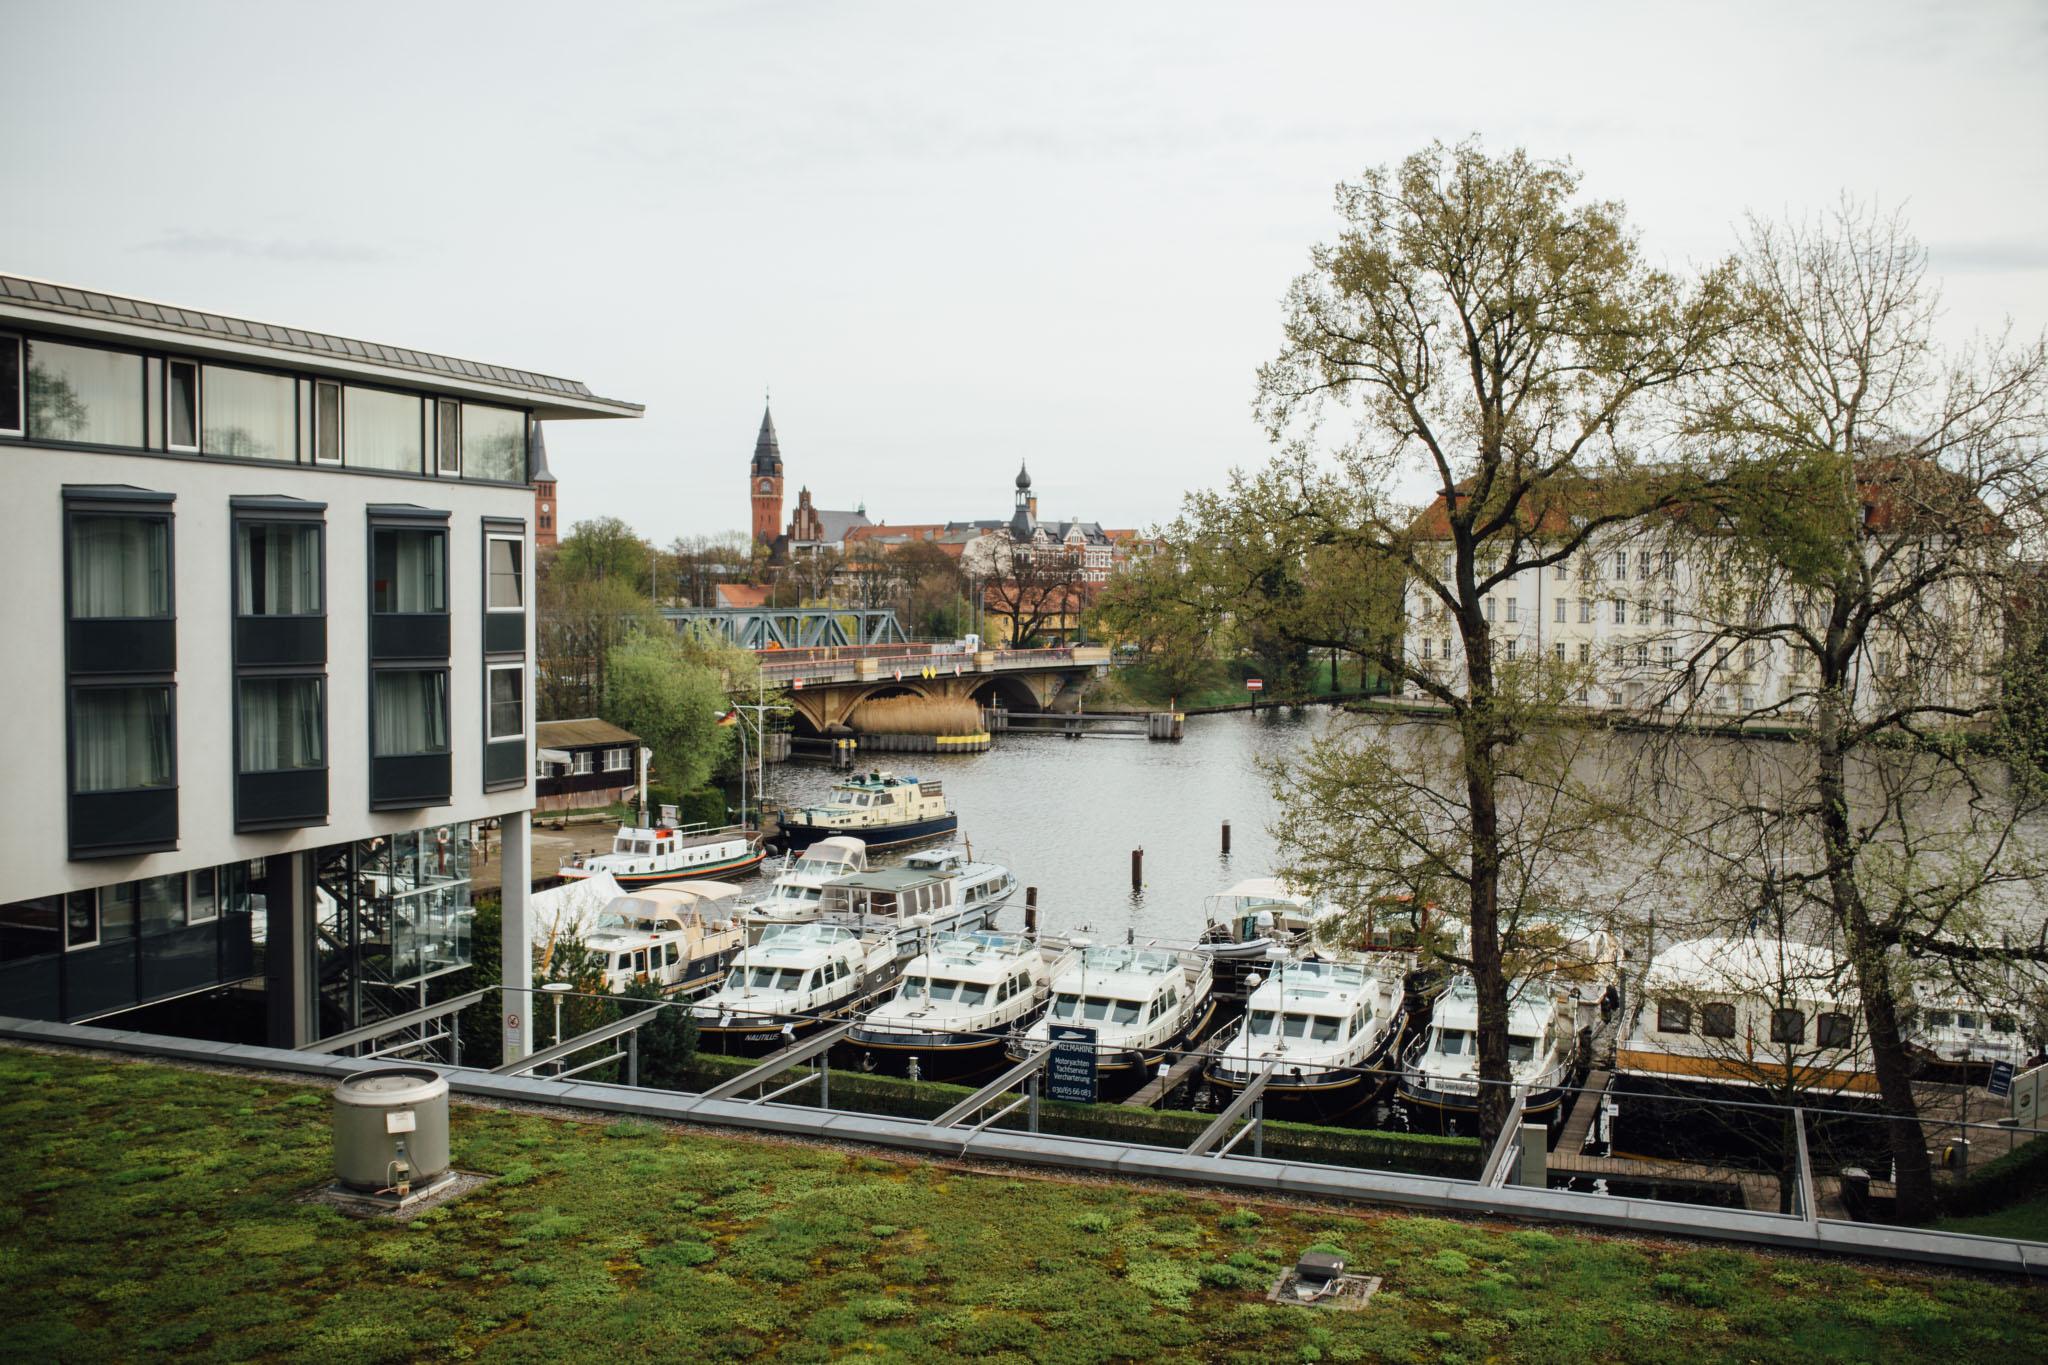 penta-hotel-berlin-köpenick-hochzeitsreportage